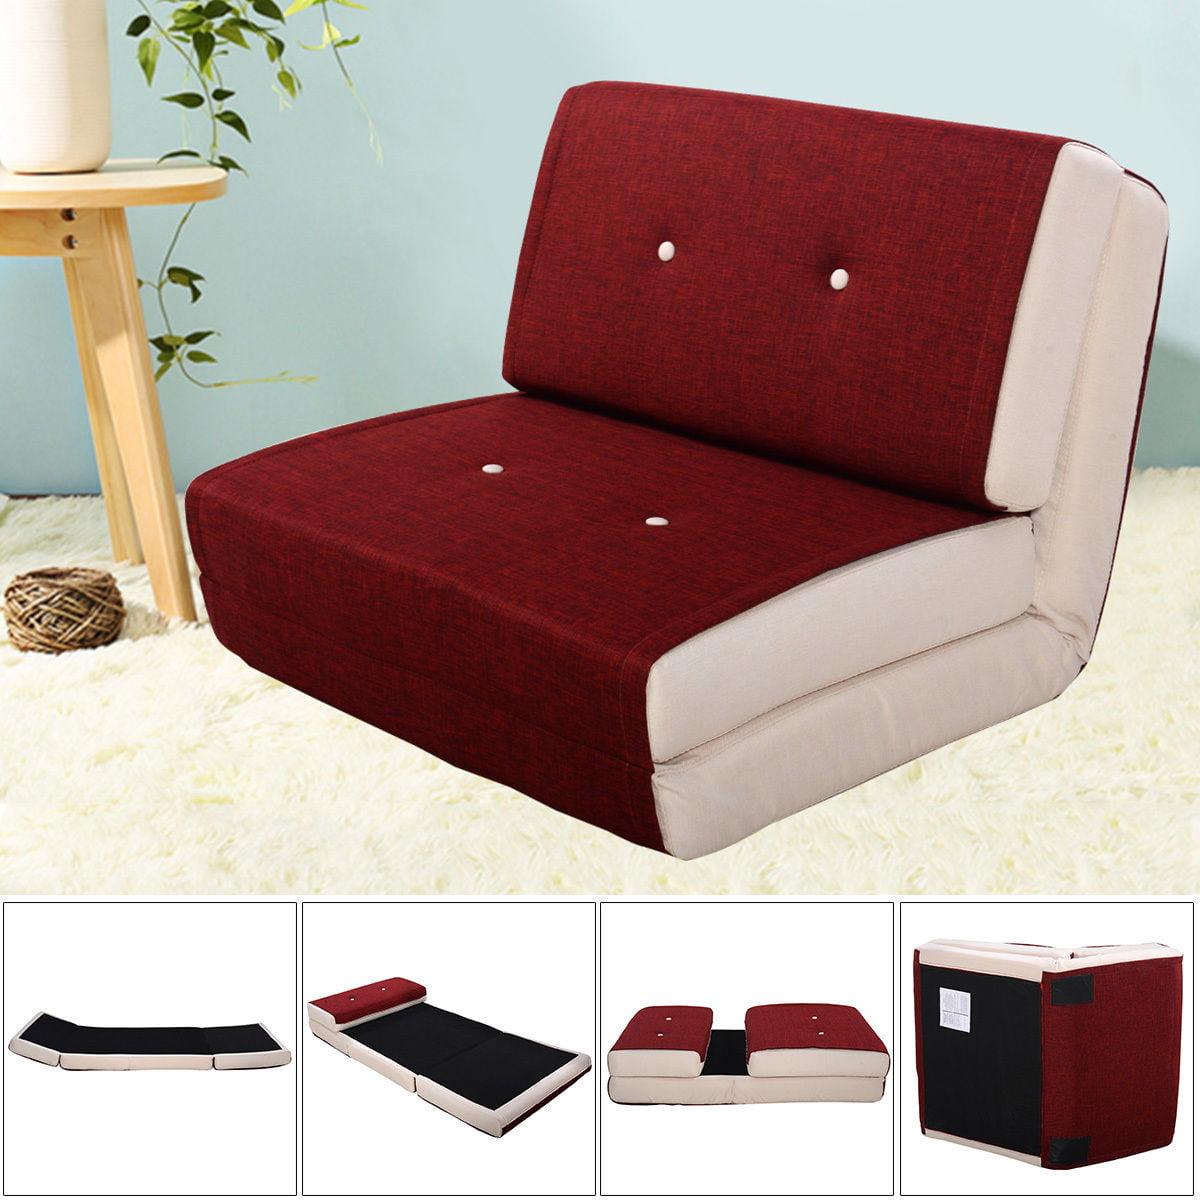 Goplus fold down chair flip out lounger convertible sleeper bed couch dorm burgundy walmart com